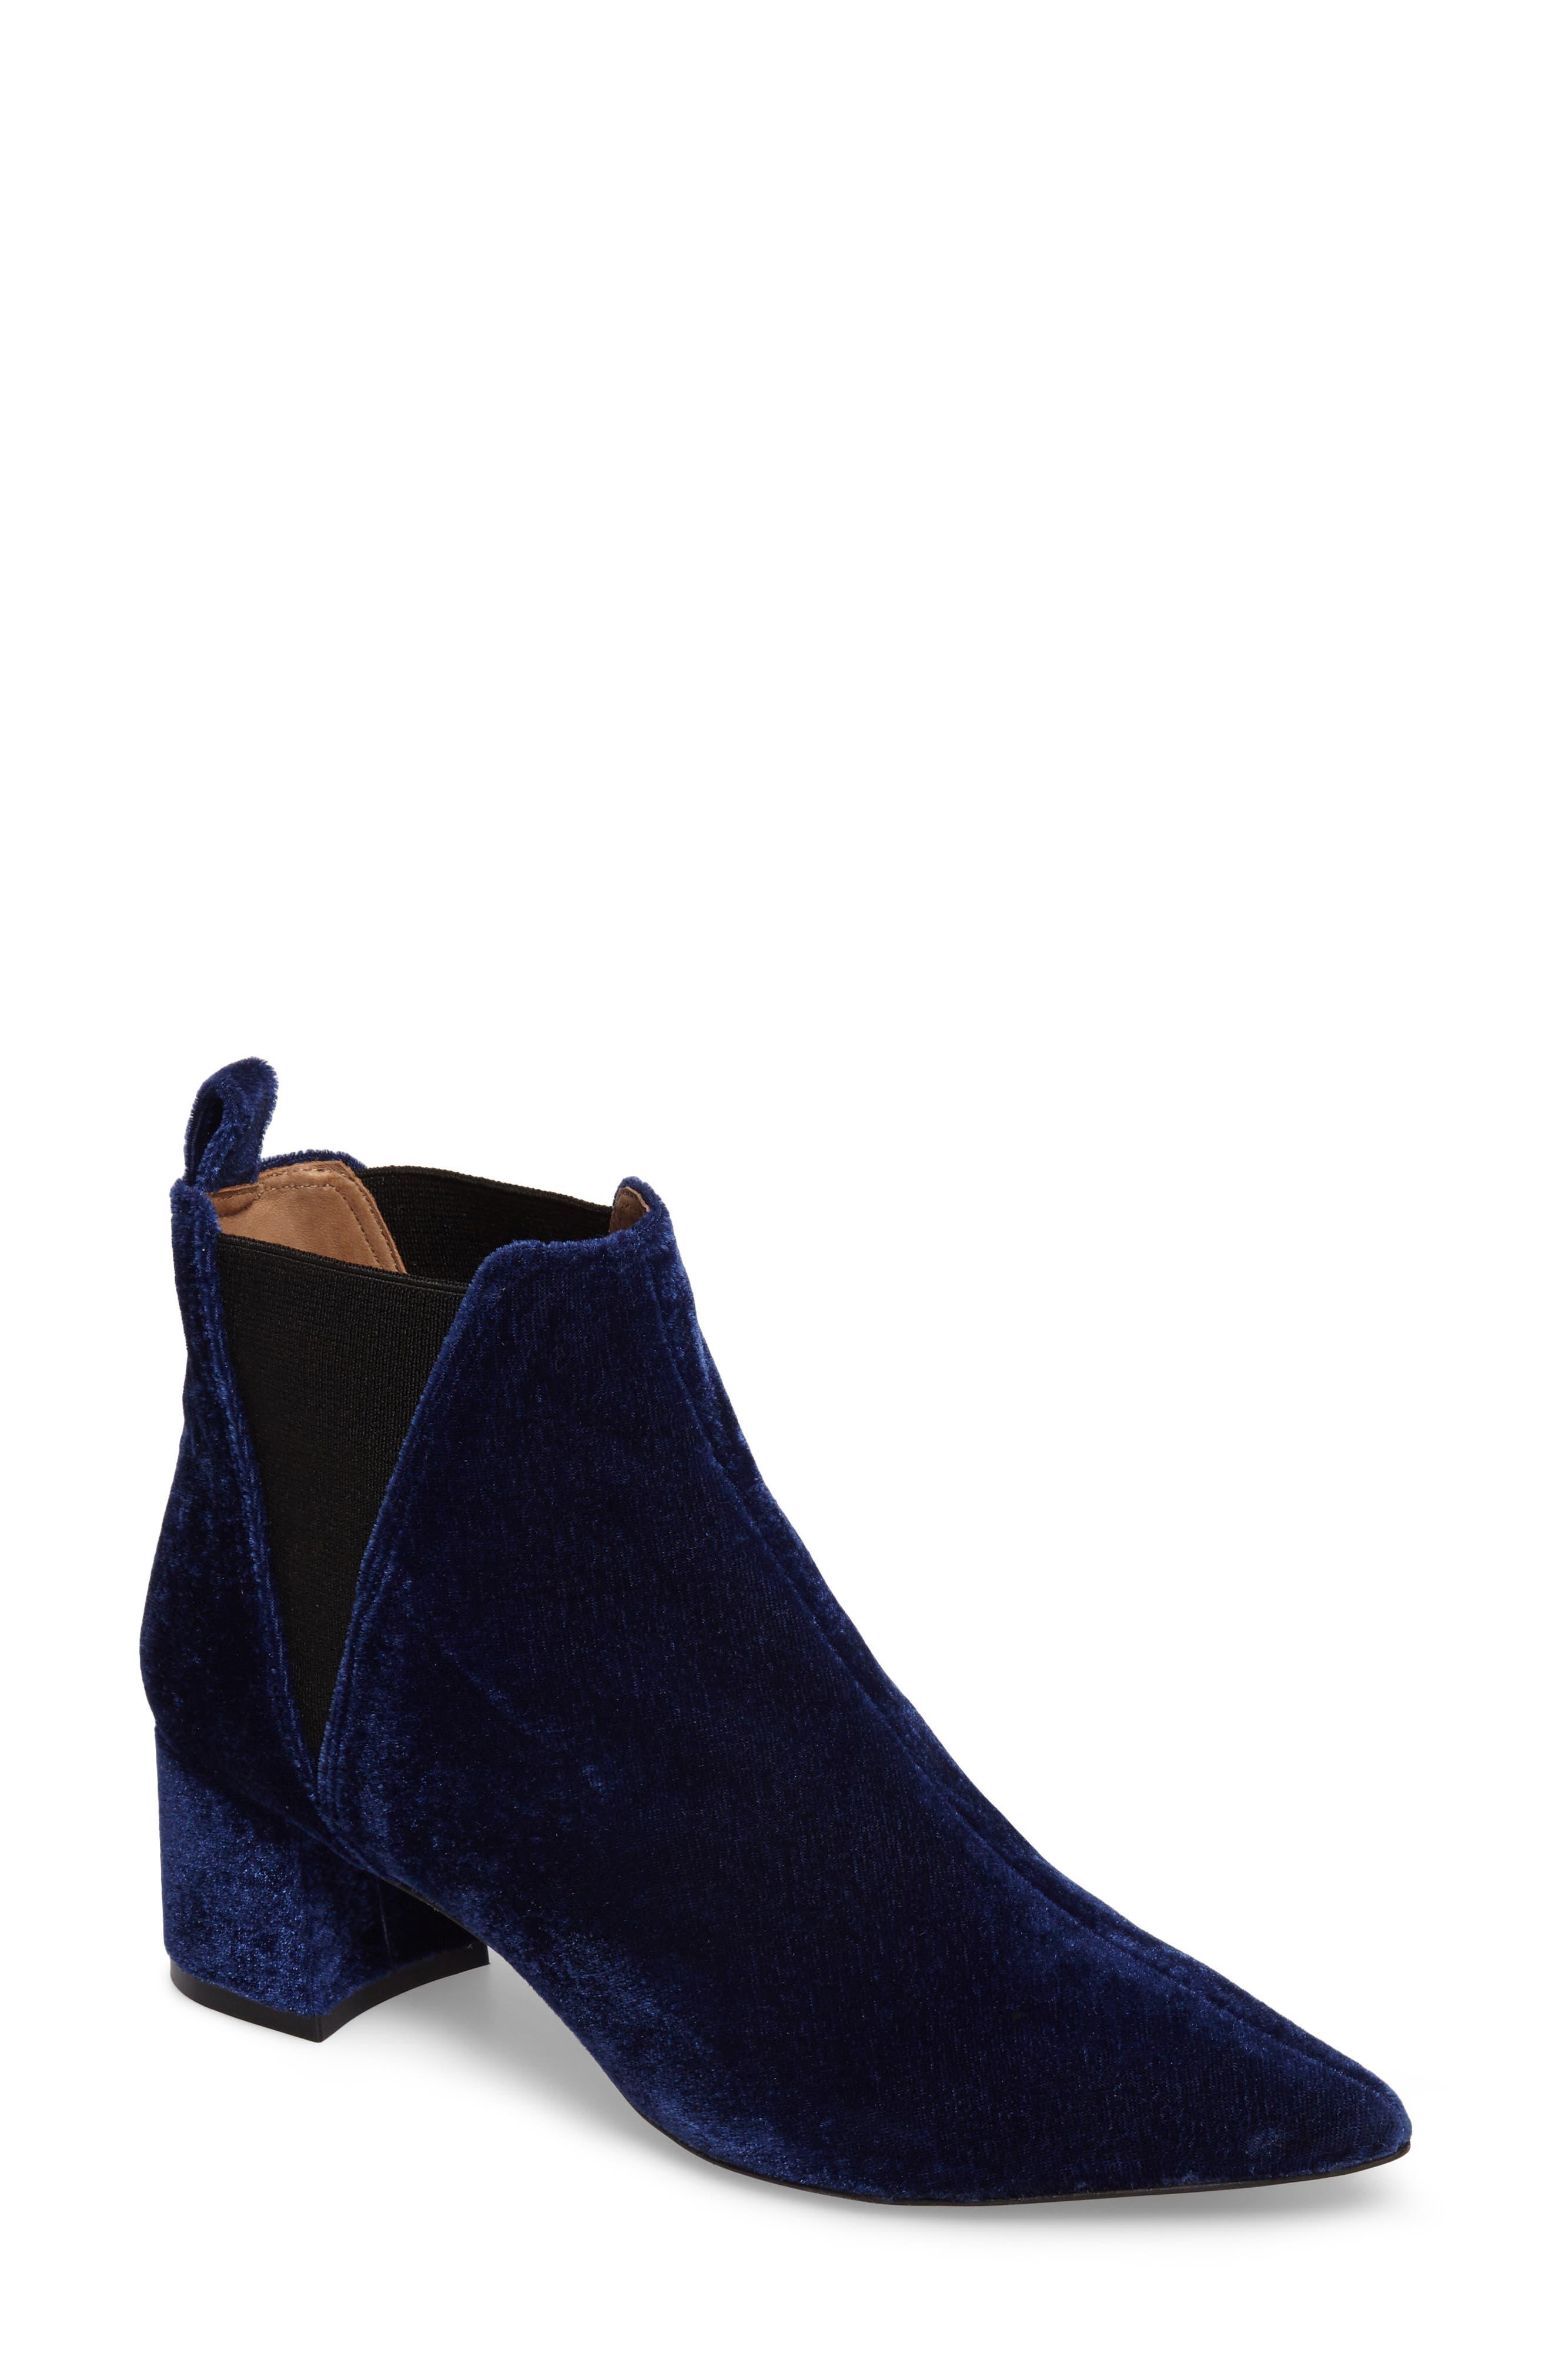 Renita Pointy Toe Chelsea Bootie,                         Main,                         color, BLUE VELVET FABRIC